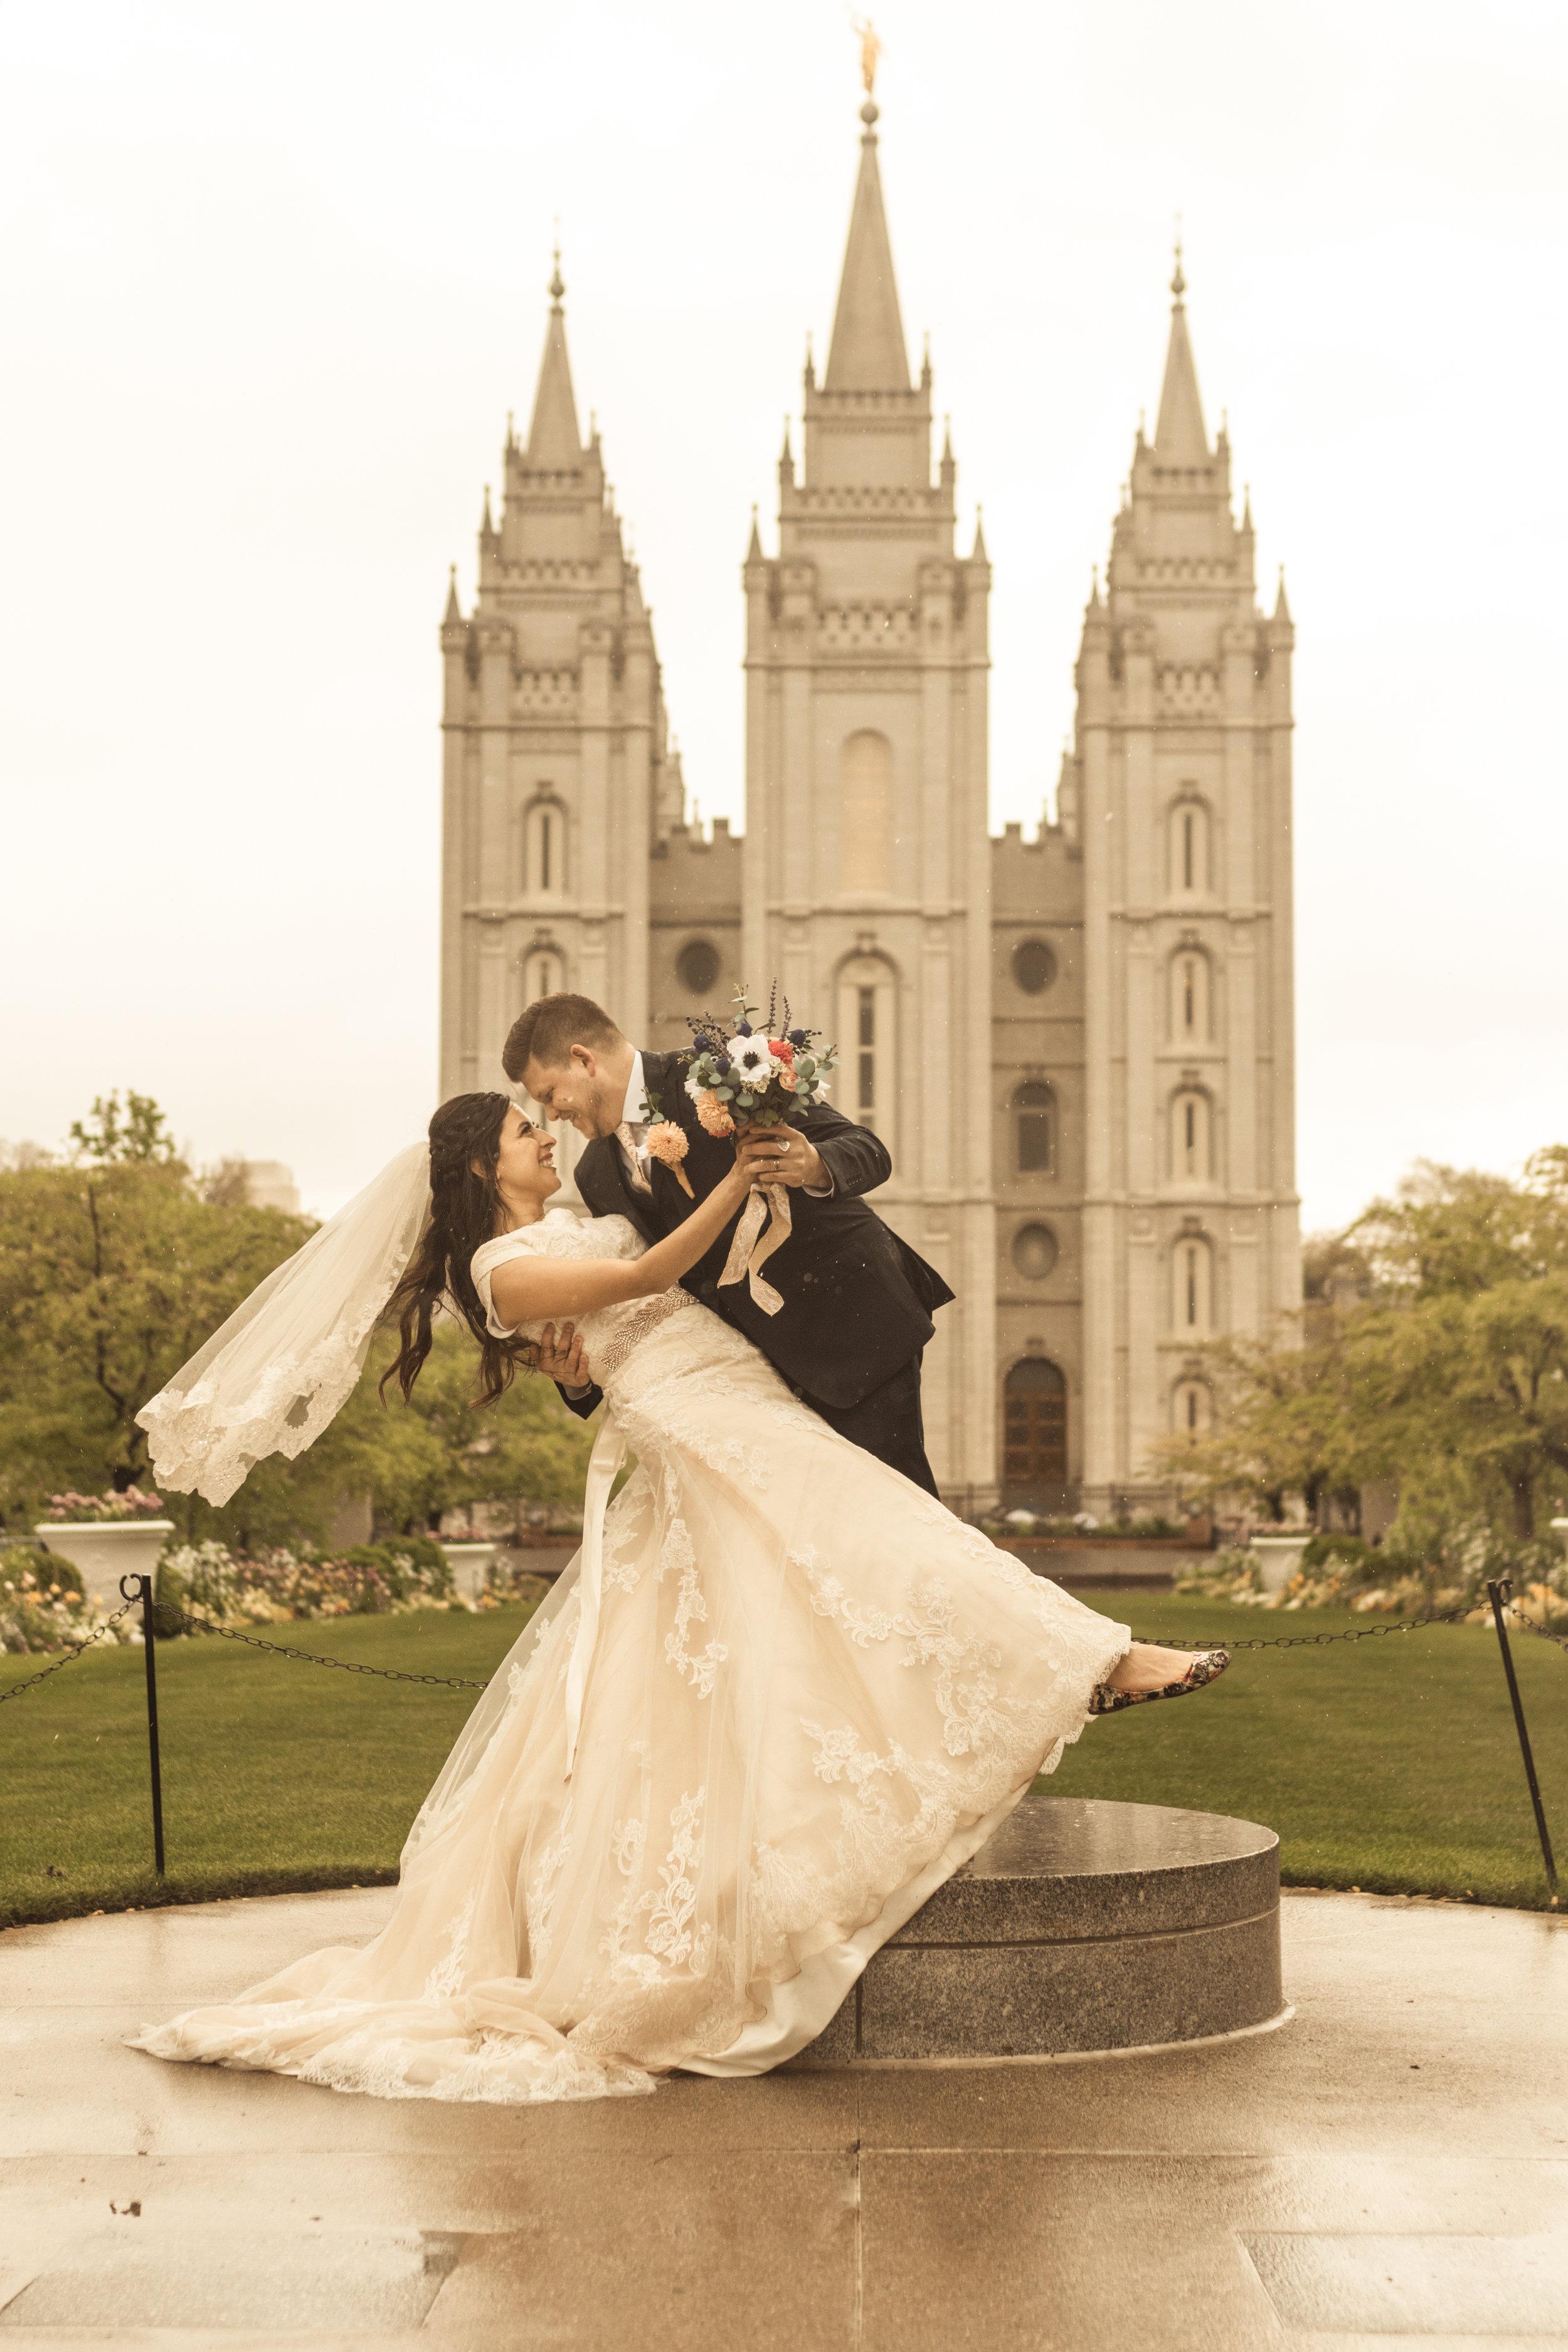 Rainy Spring Wedding at the Salt Lake Templeby Bri Bergman Photography04.JPG